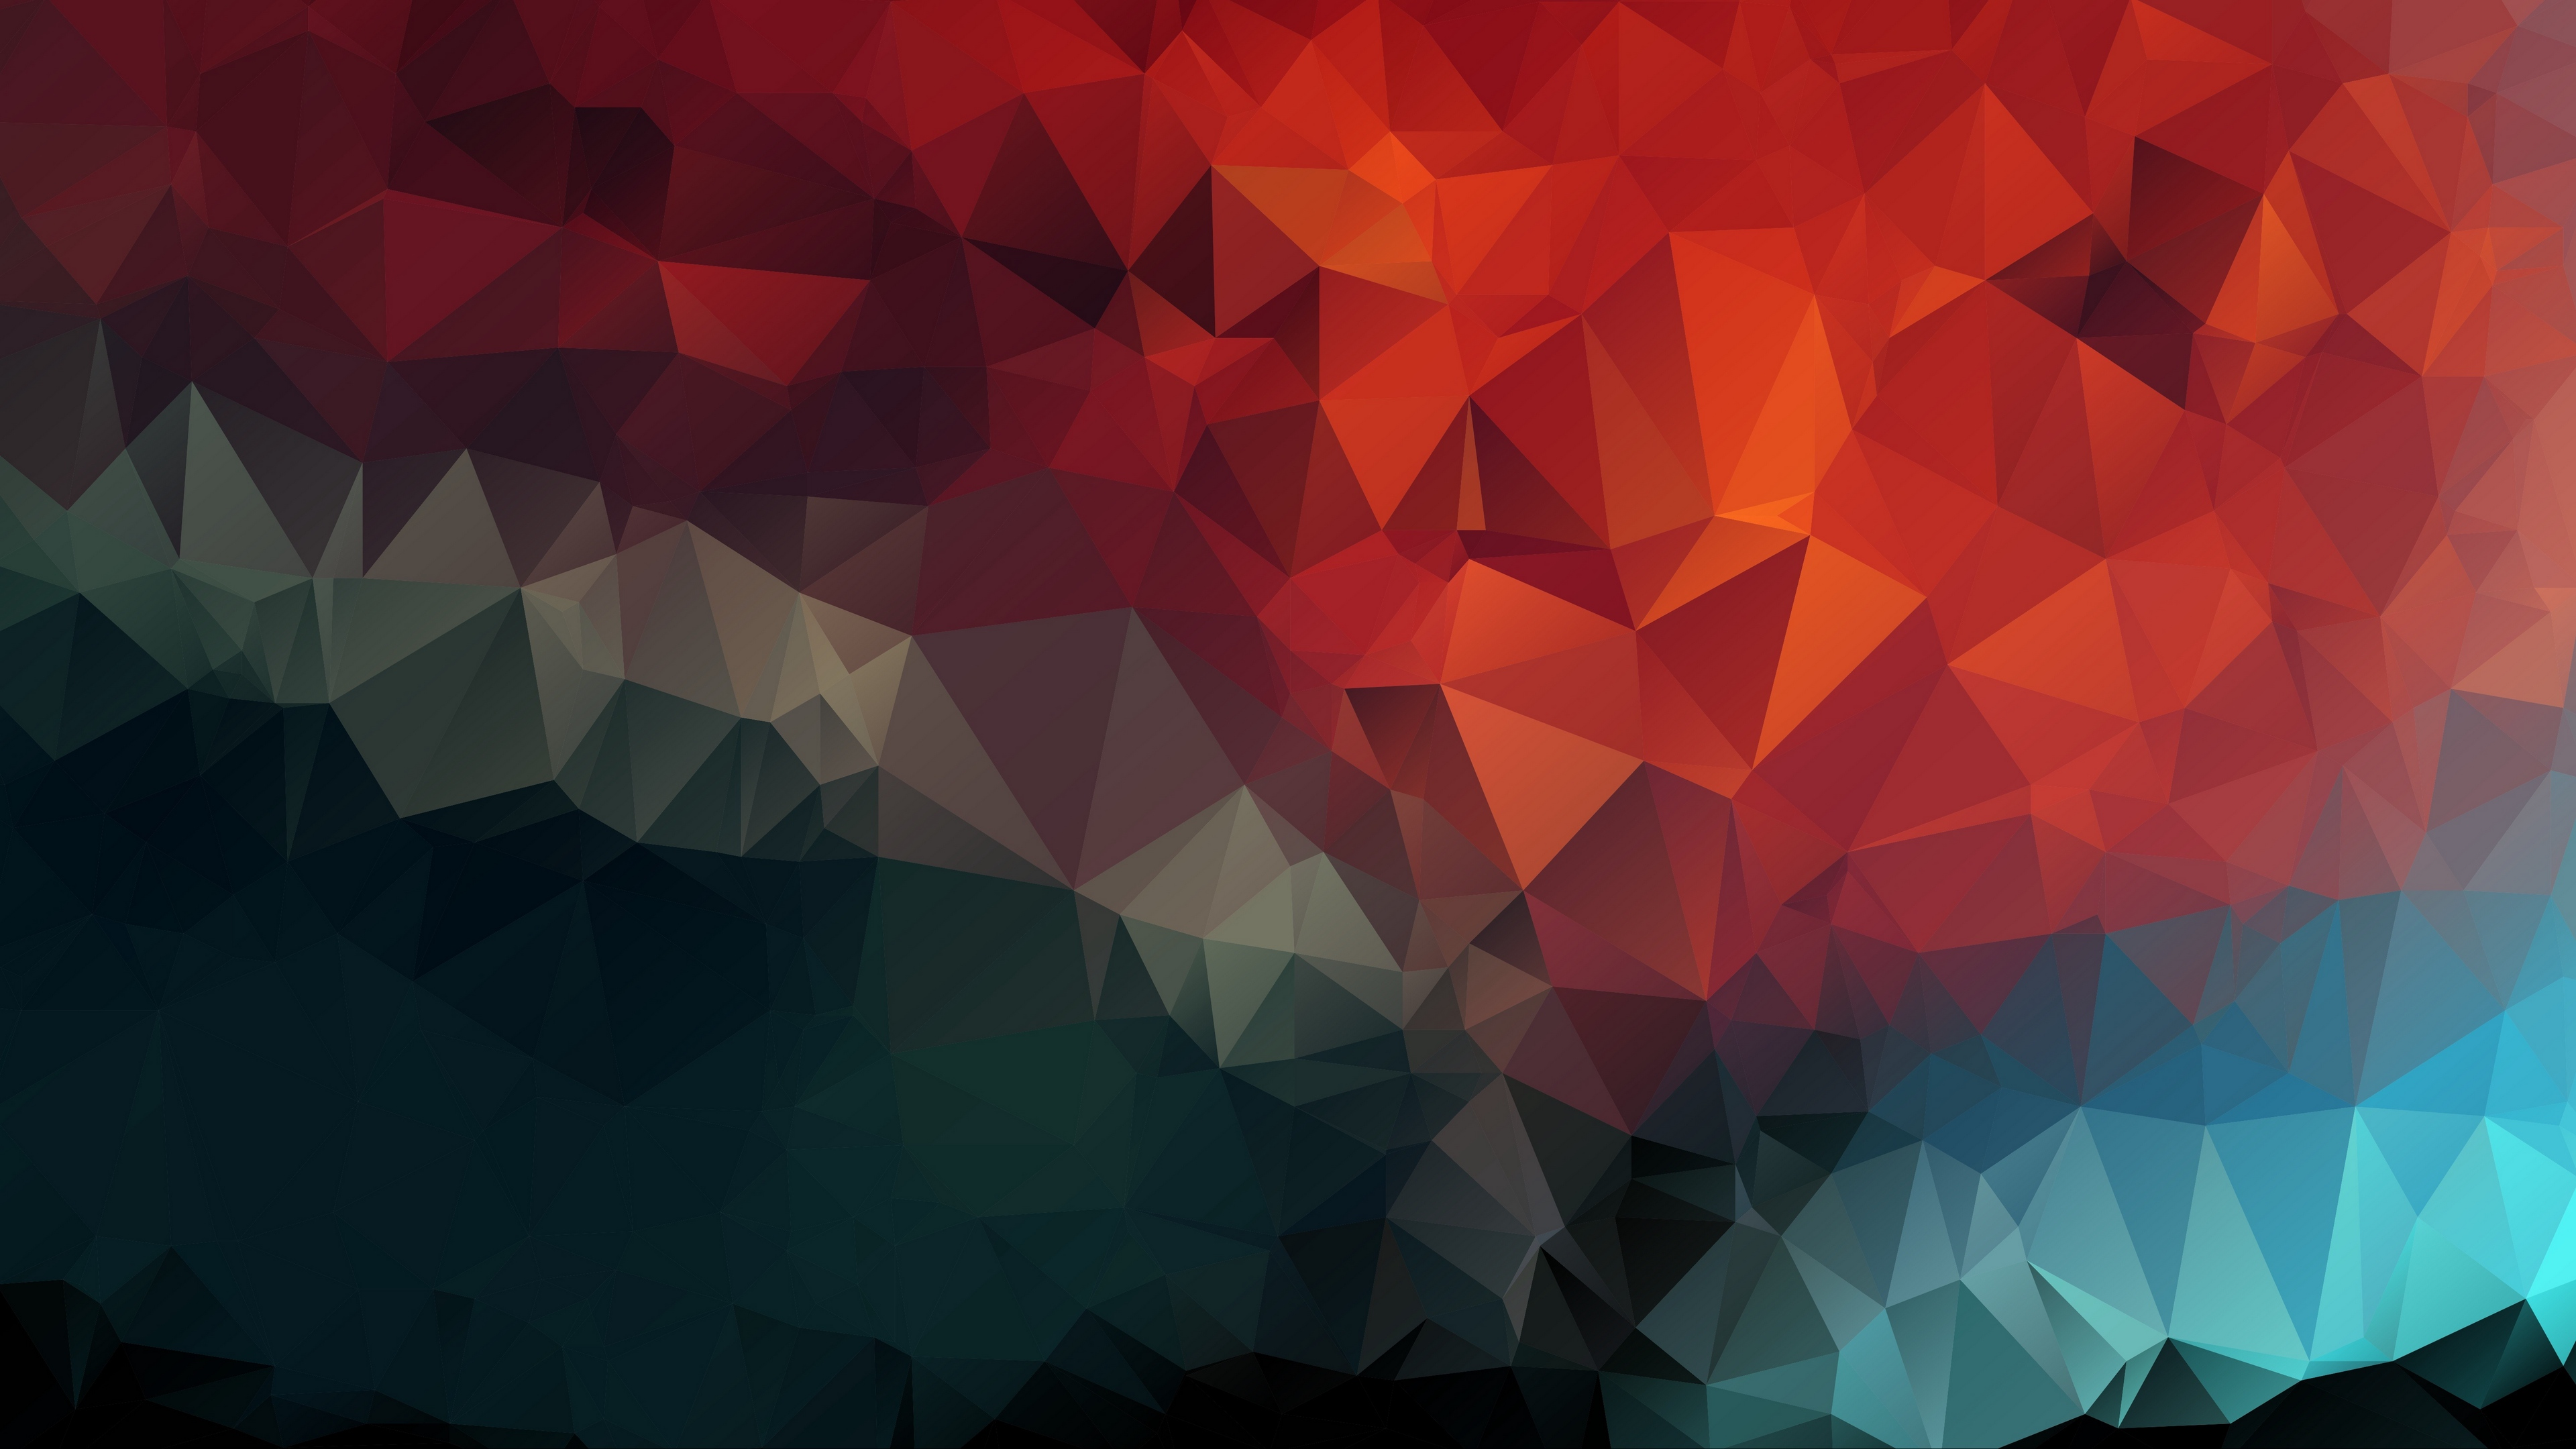 triangles geometric mosaic 4k 1536097737 - triangles, geometric, mosaic 4k - Triangles, Mosaic, Geometric